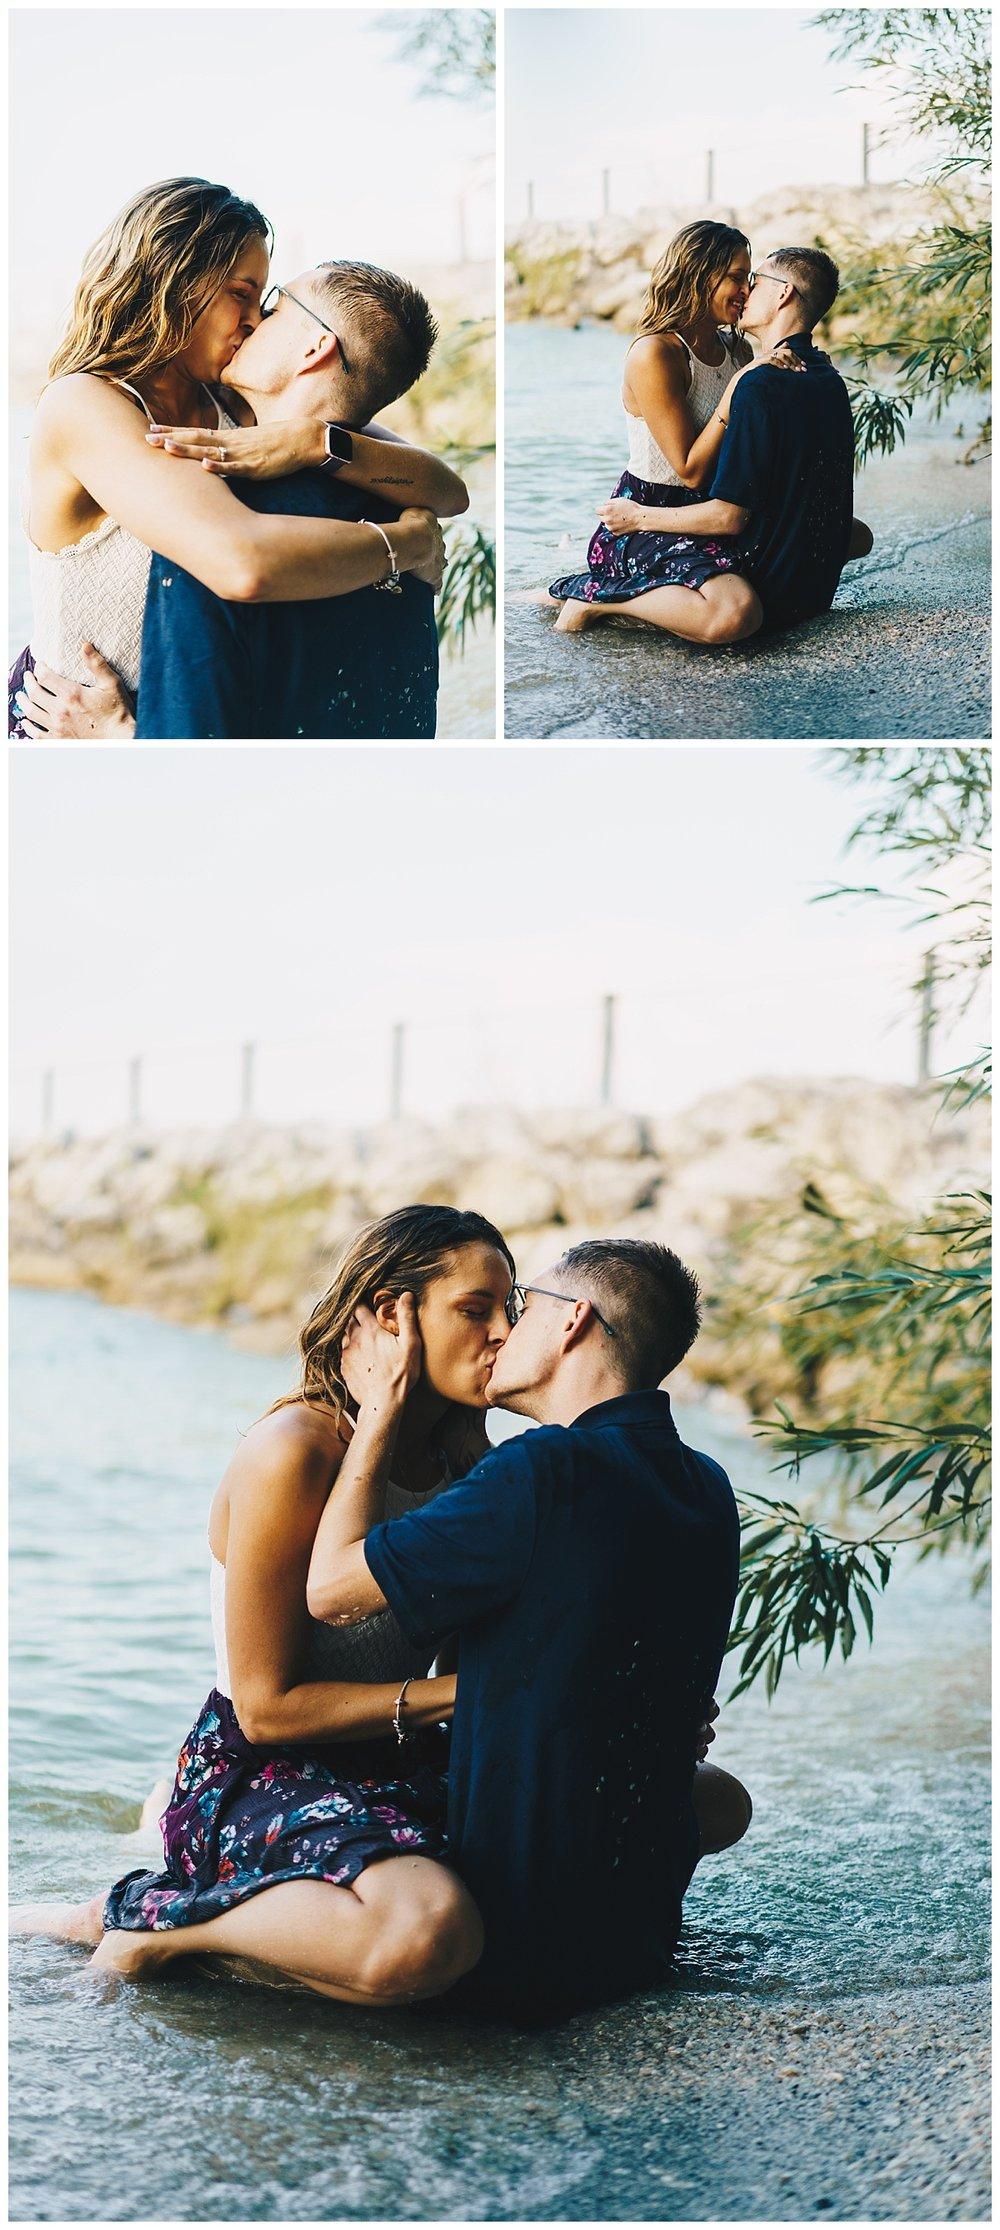 Nashville Wedding Photographer_N&L Engagement Session-15